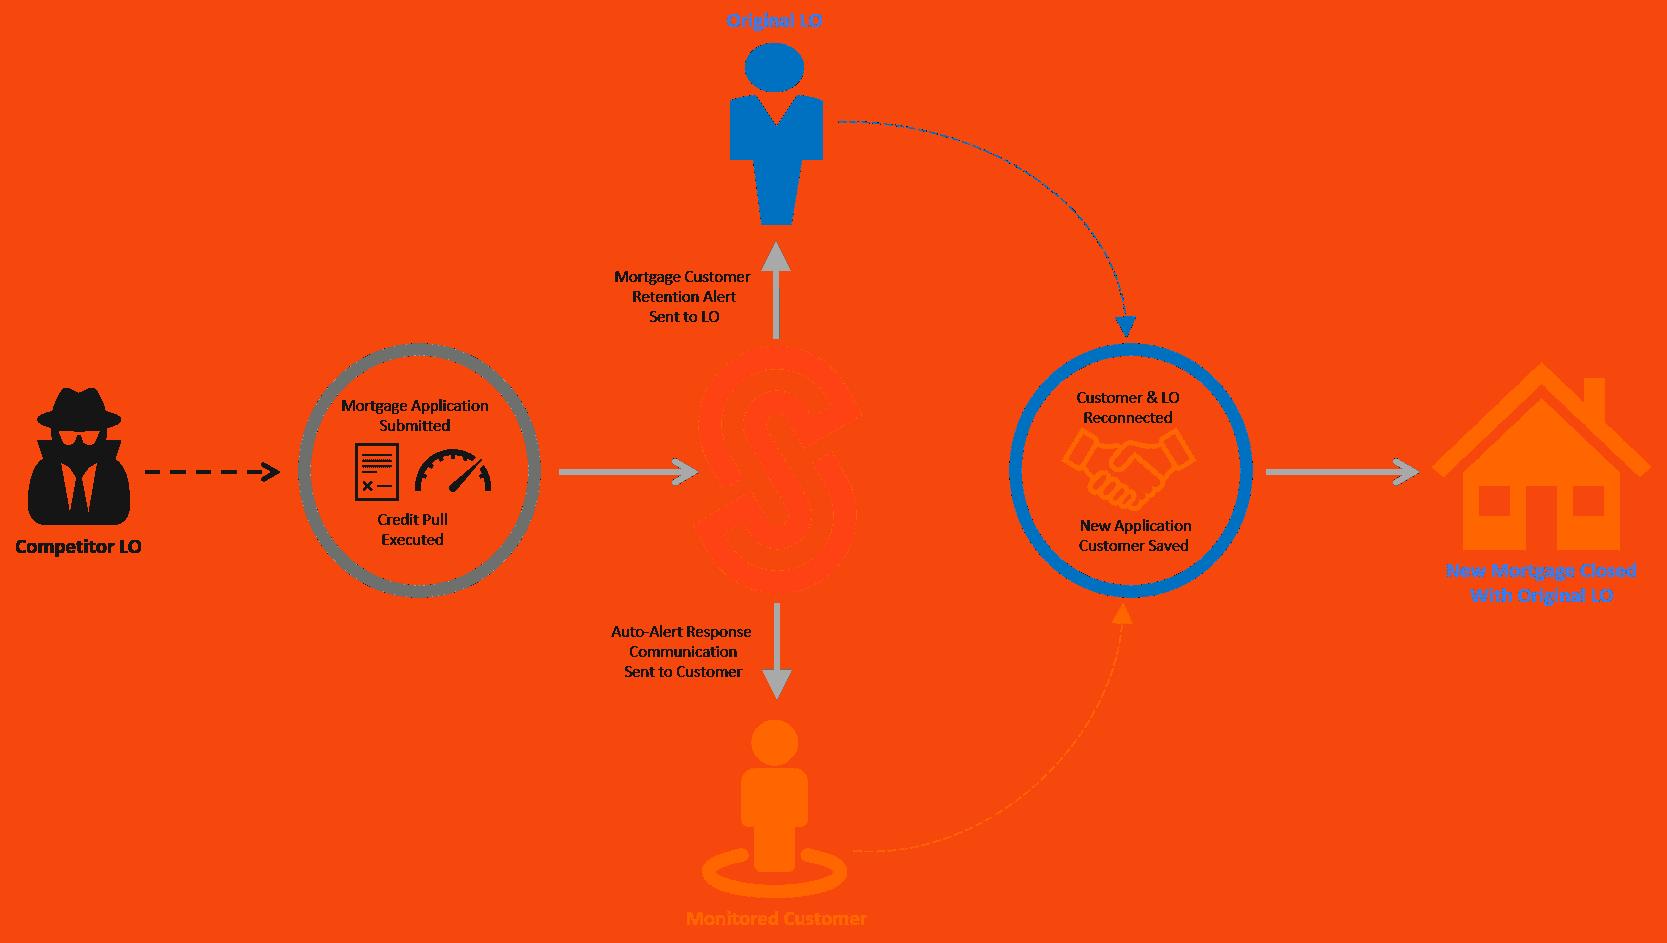 stikkum-reconnect-process-new